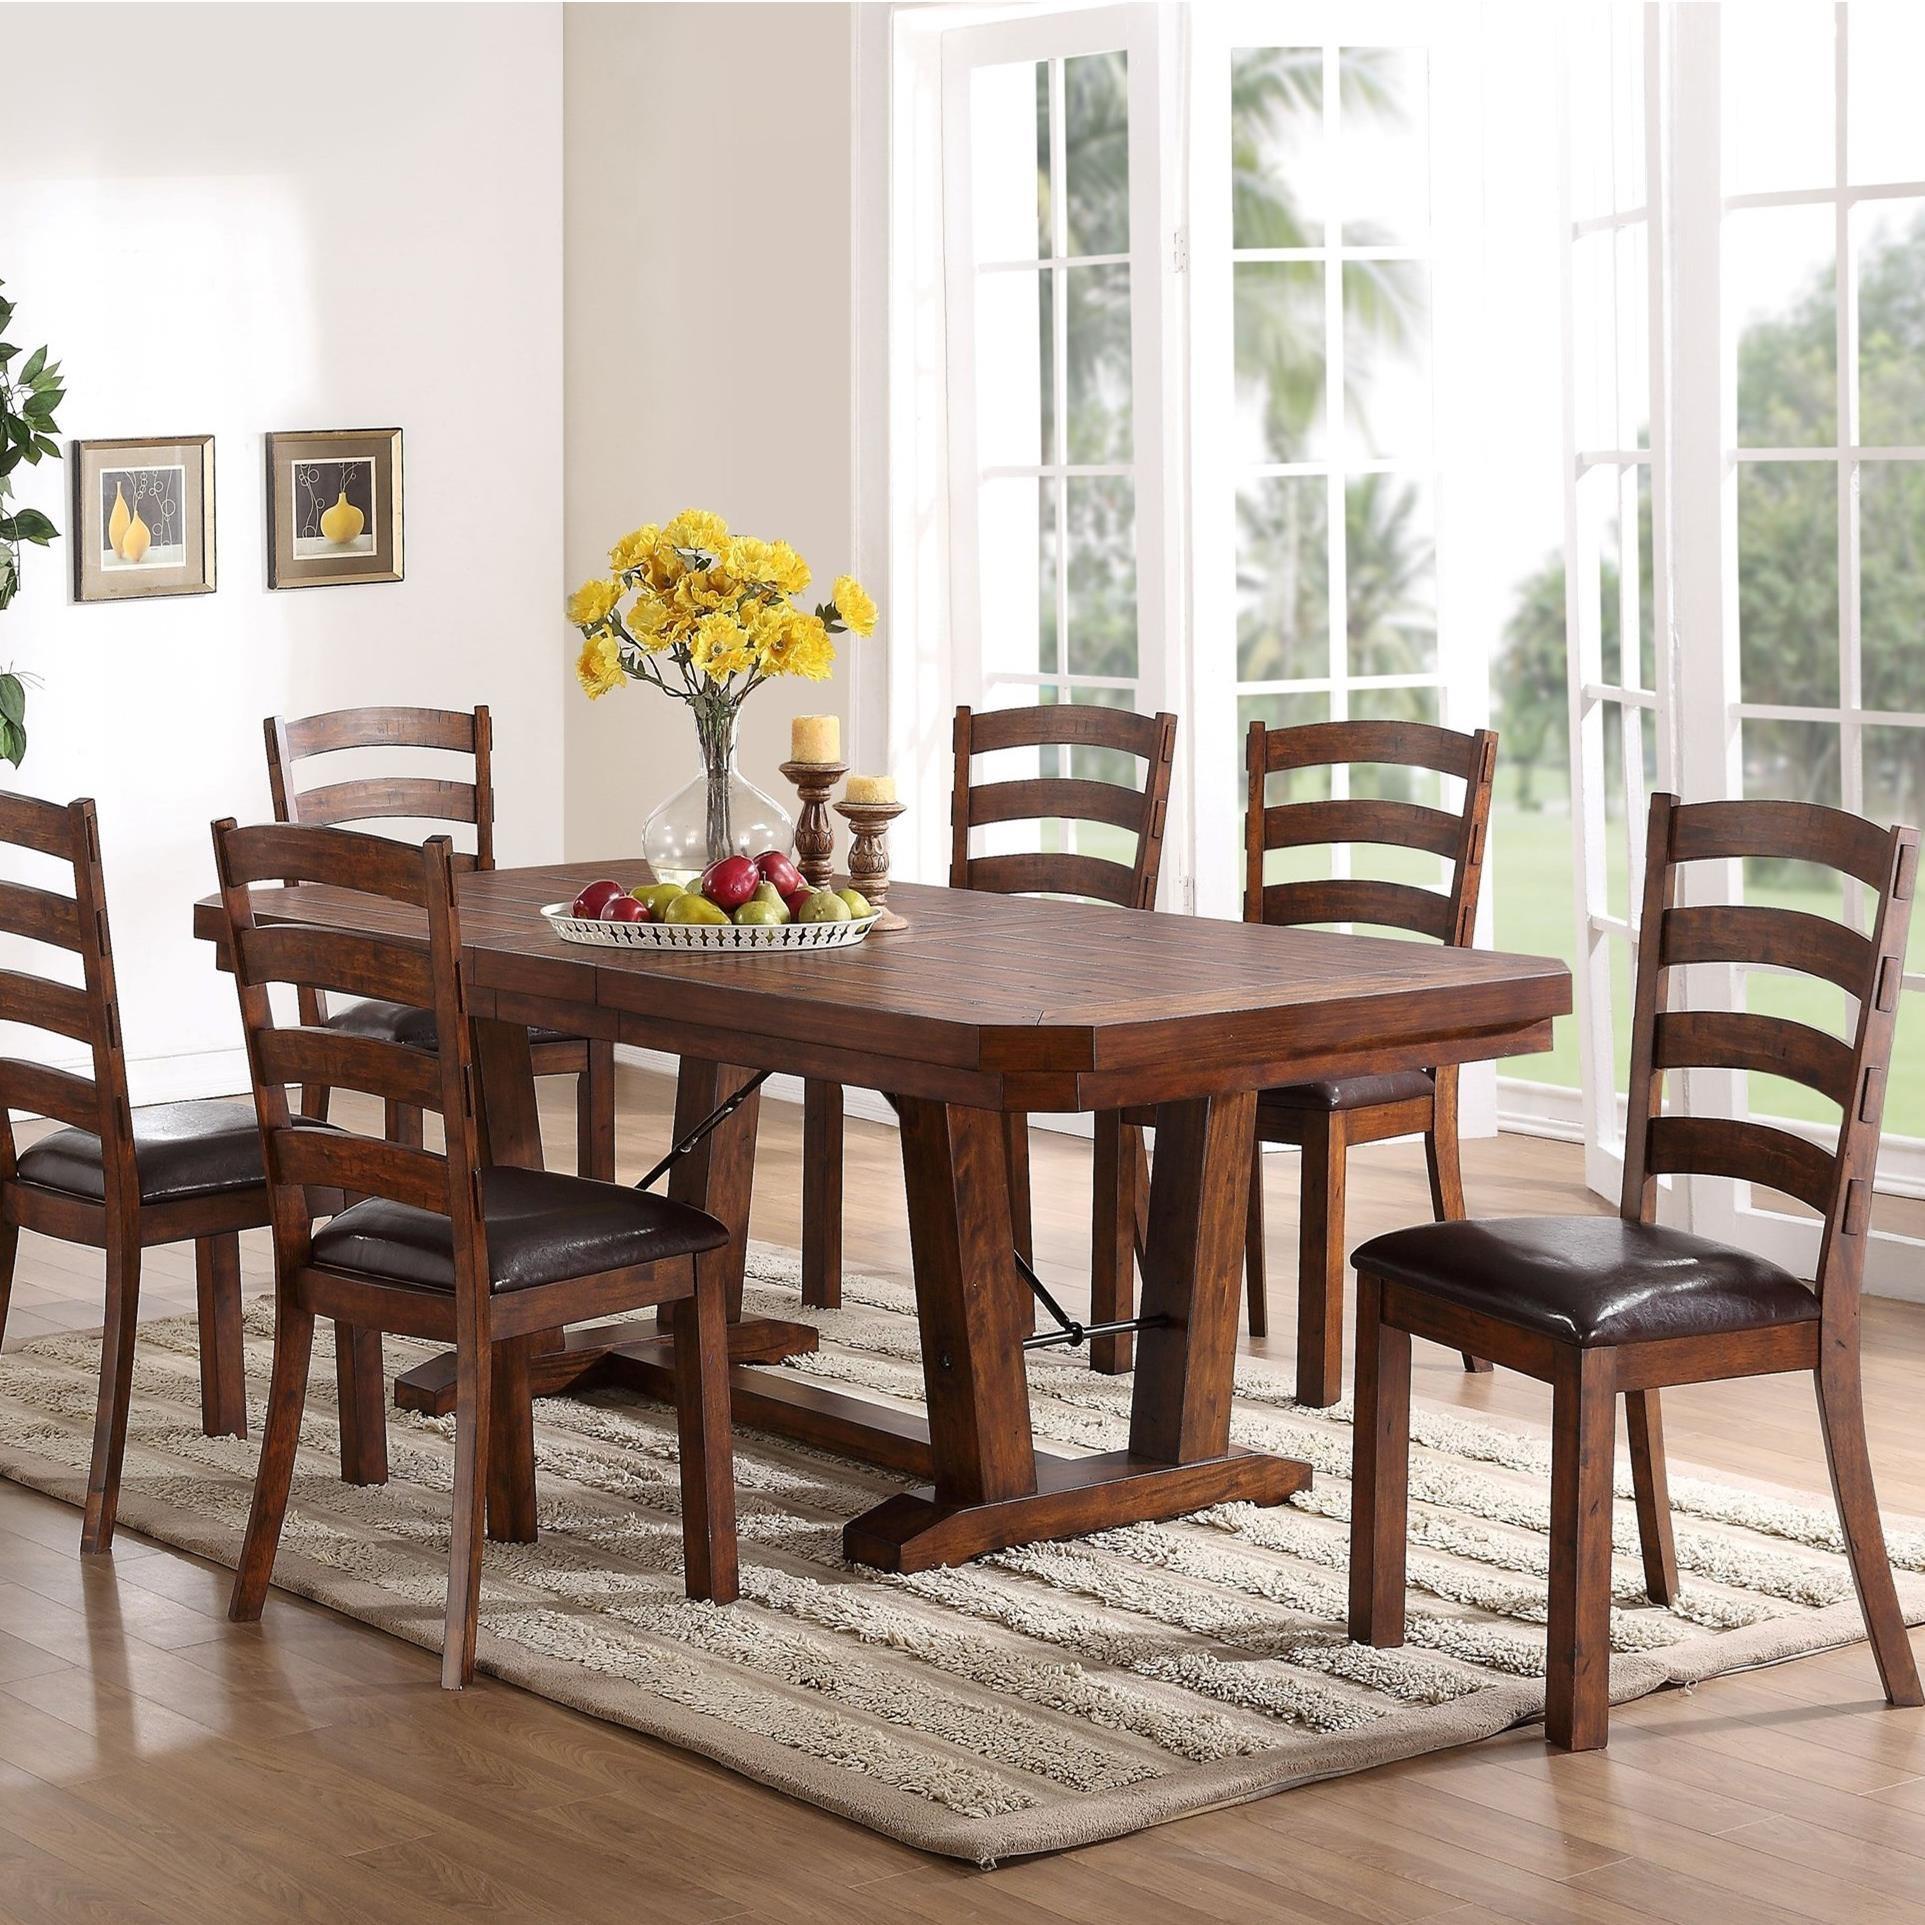 New Classic Lanesboro 7 Piece Dining Table Set - Item Number: D0376-10+10B+6x20